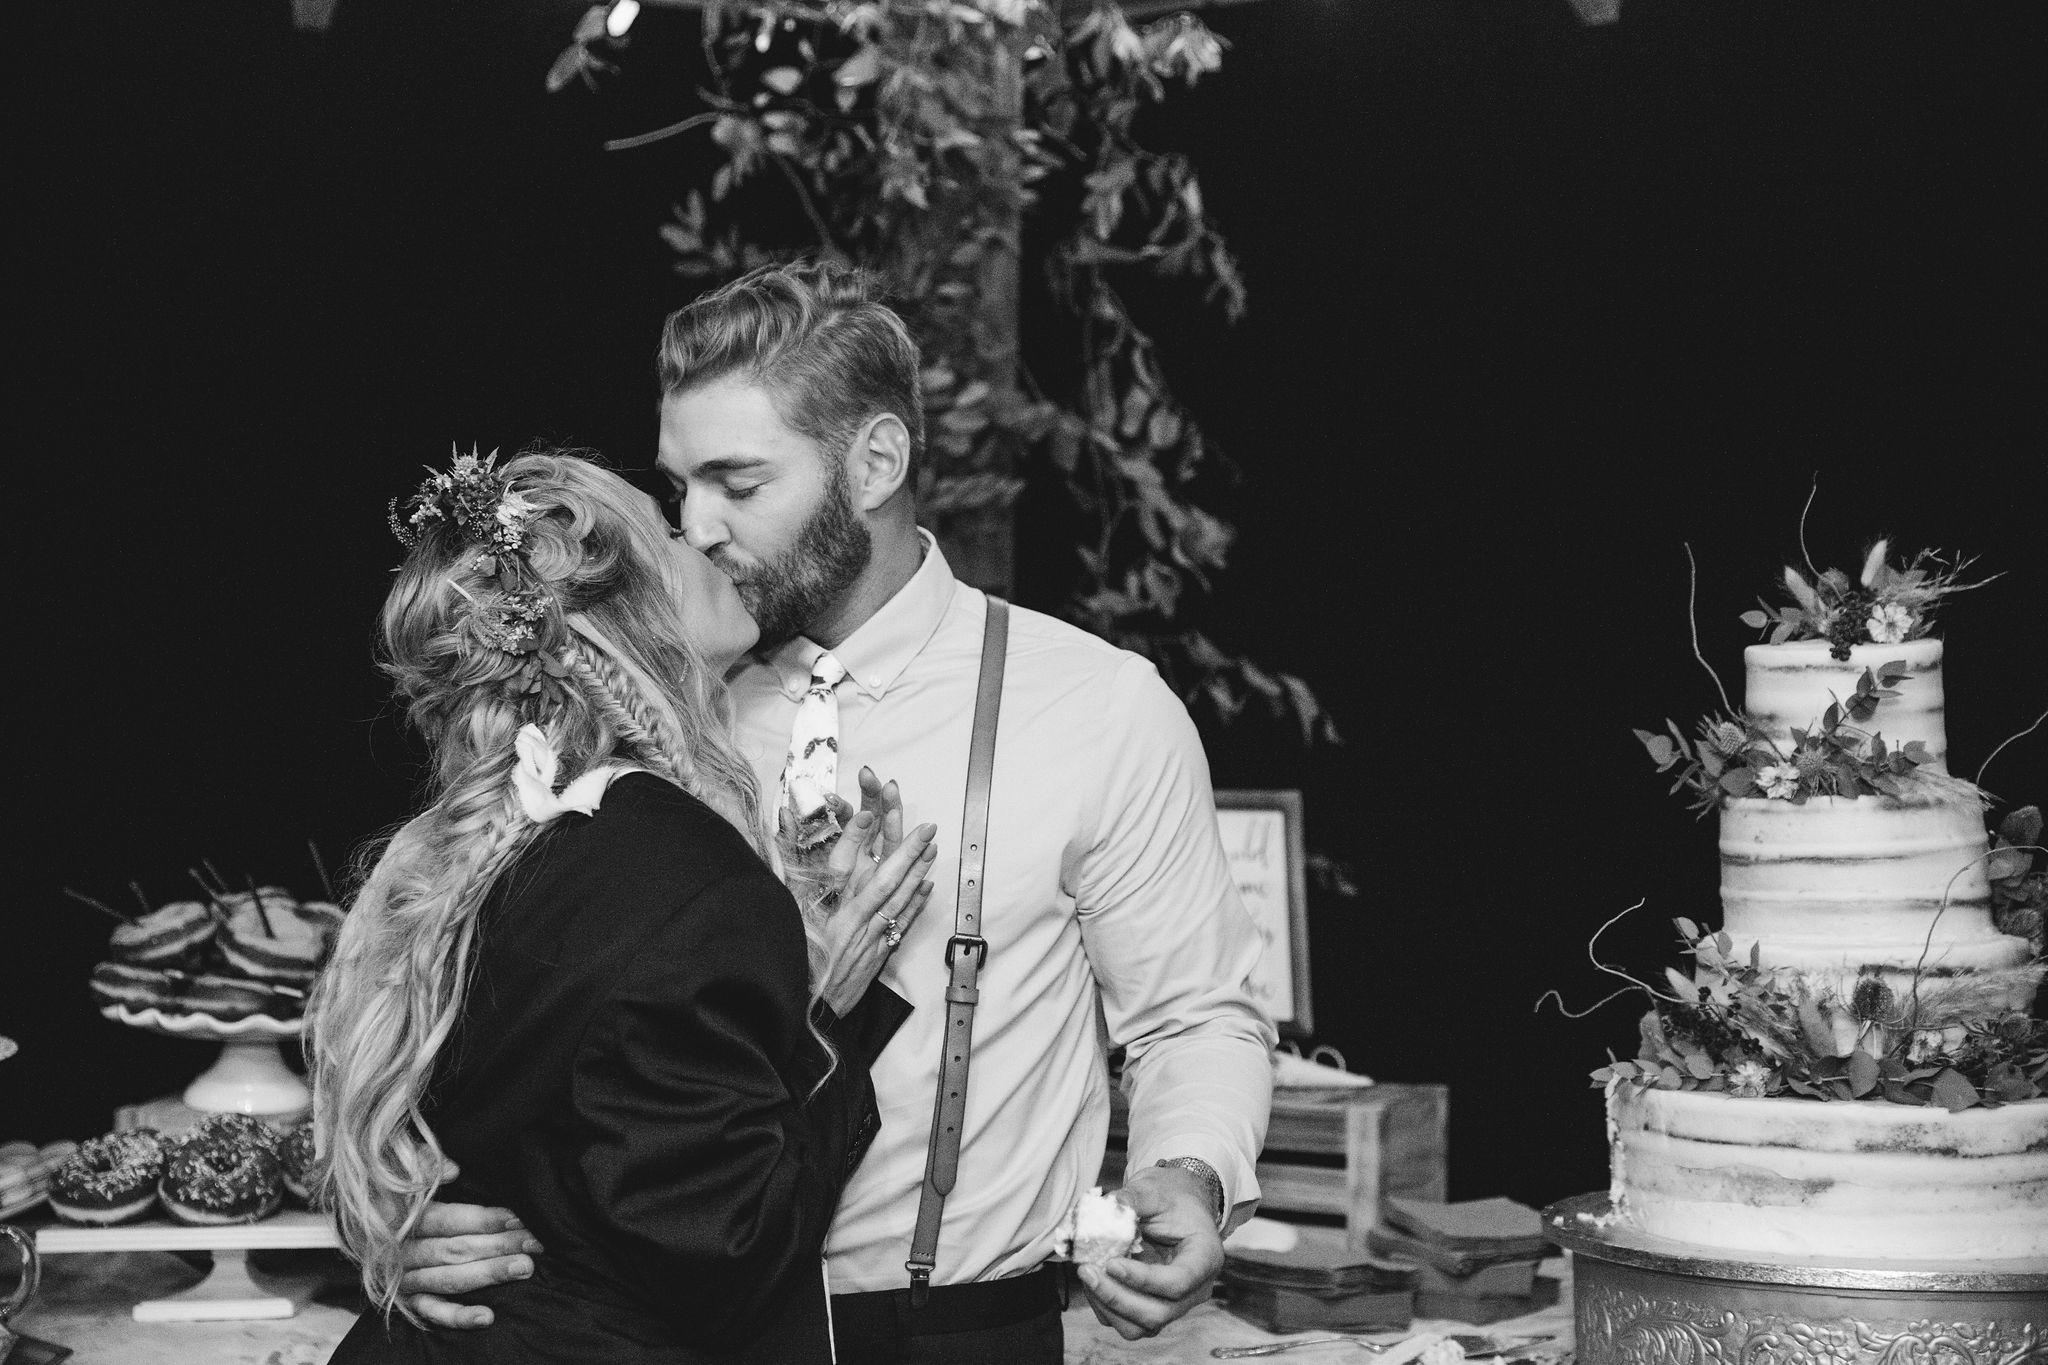 Jesseandlex_181103_AlexisNate_Wedding_Reception_228.jpg